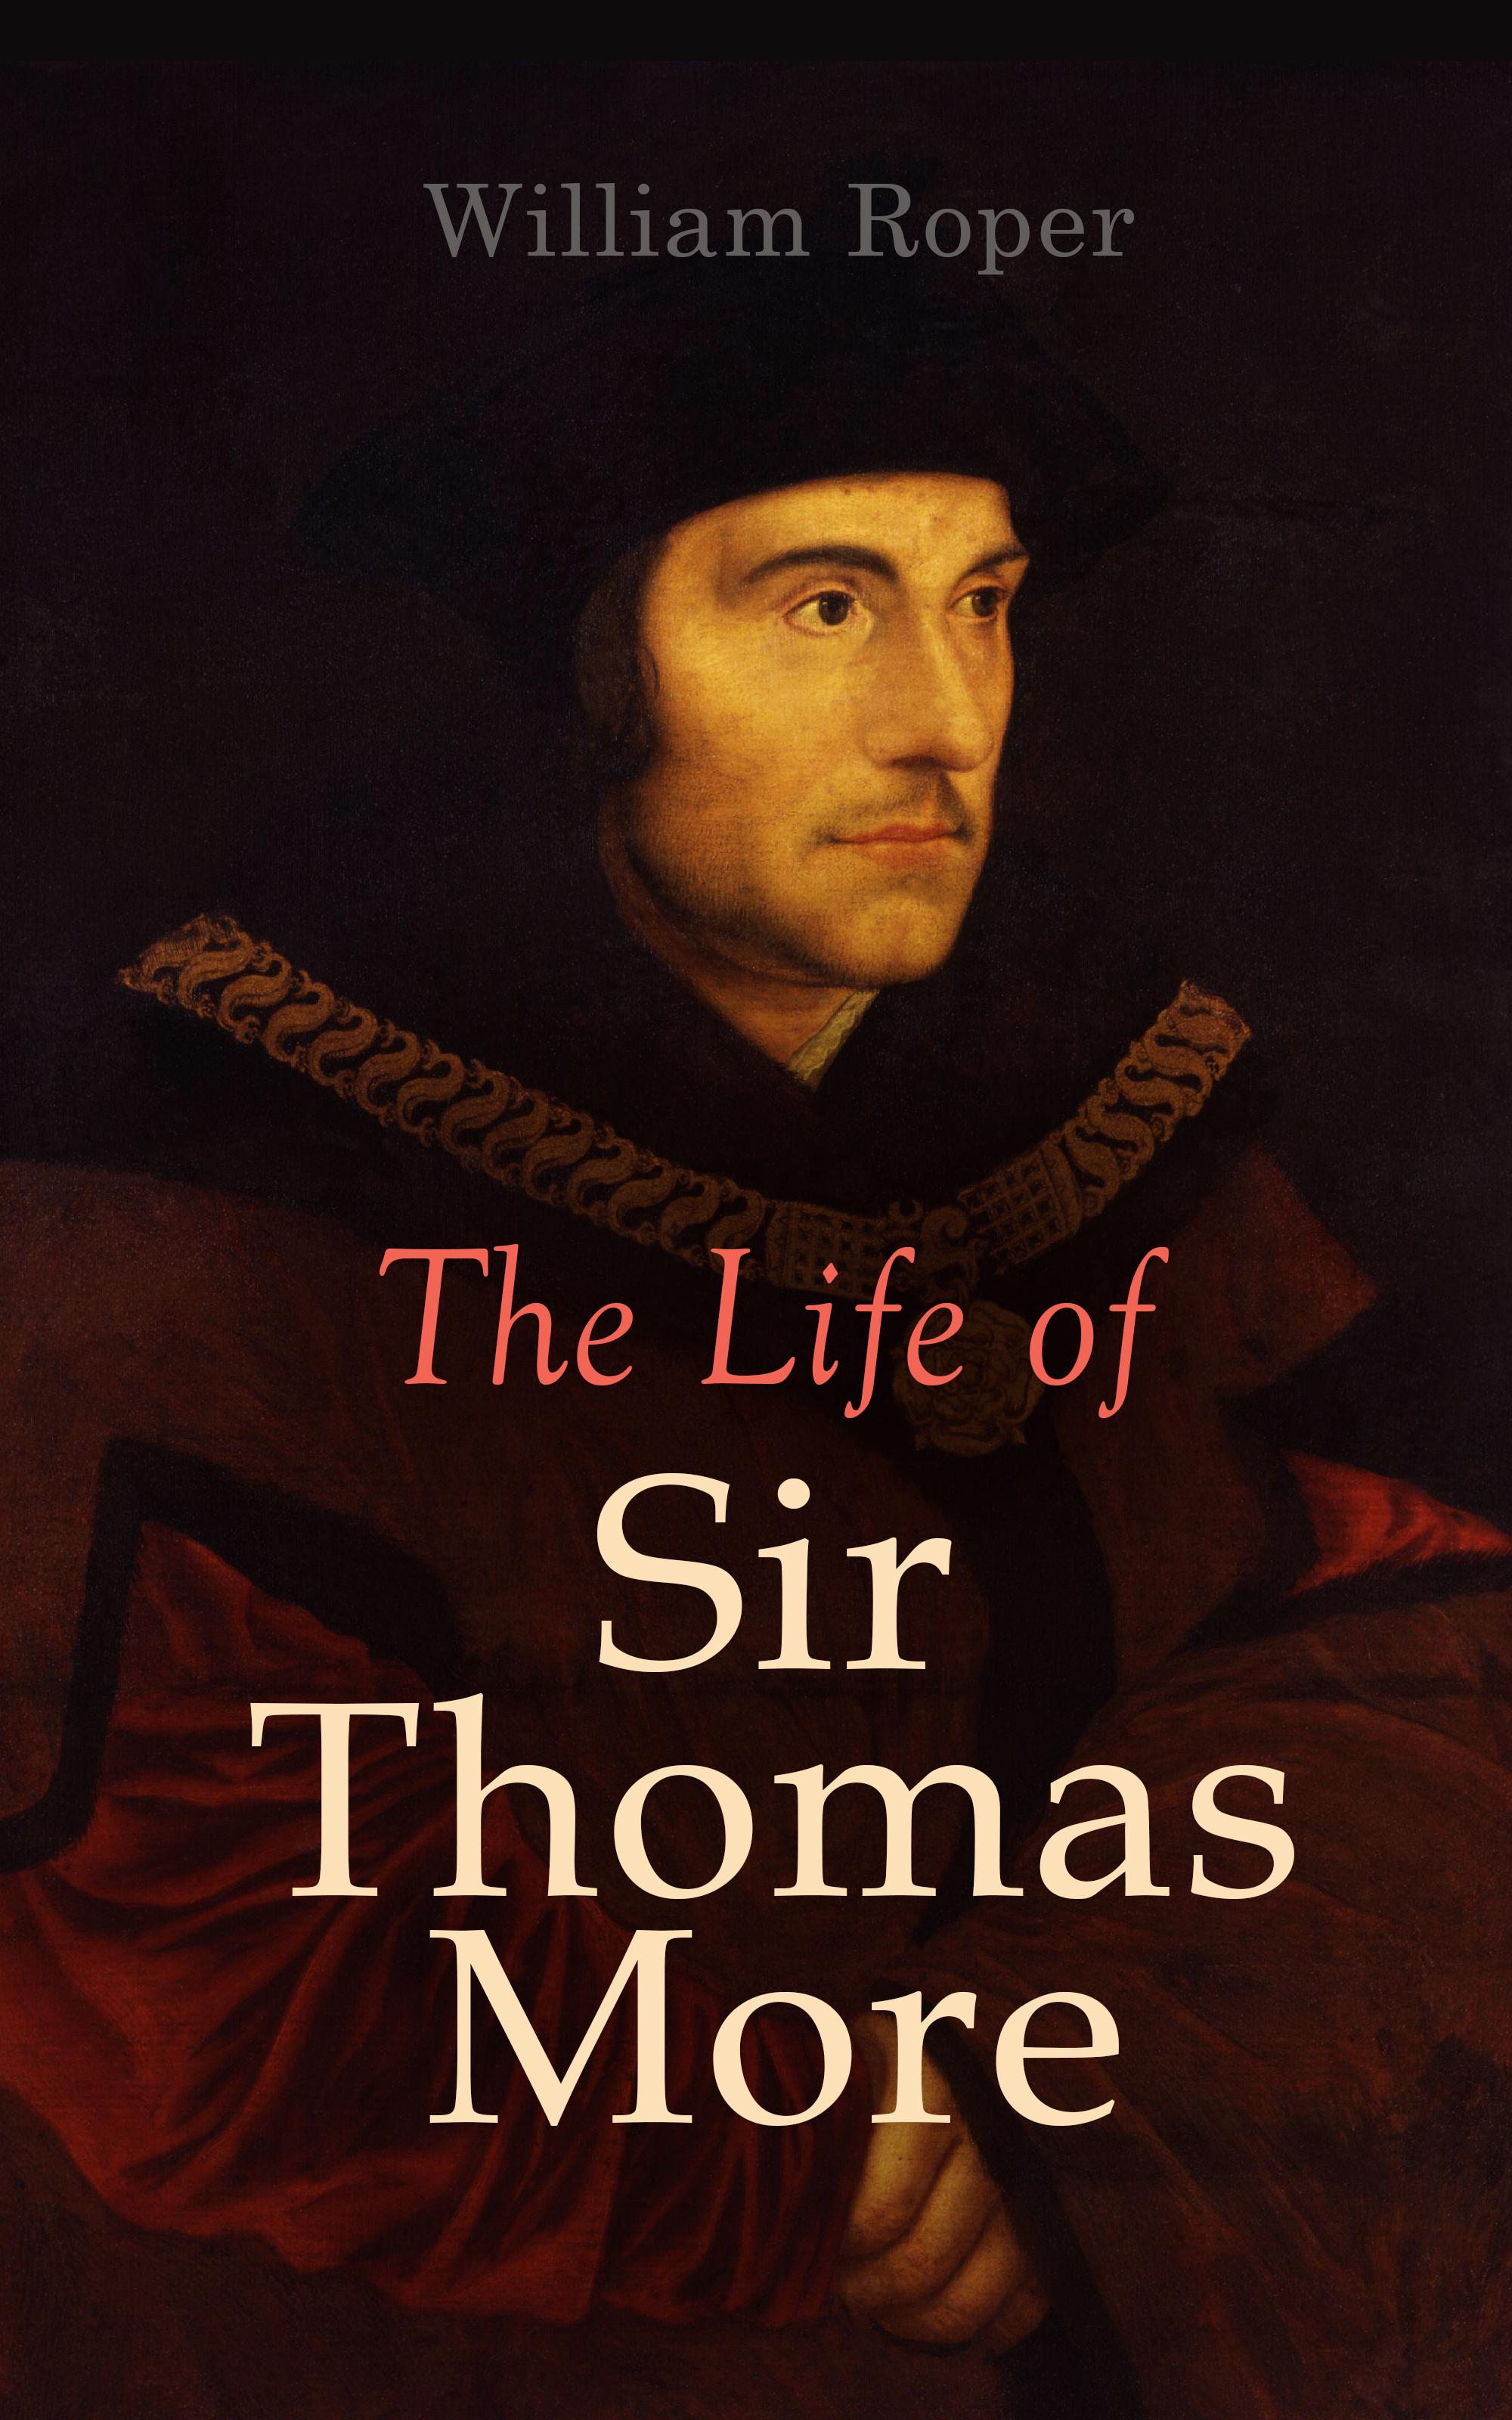 William Roper L. The Life of Sir Thomas More william leete stone the life and times of sir william johnson bart